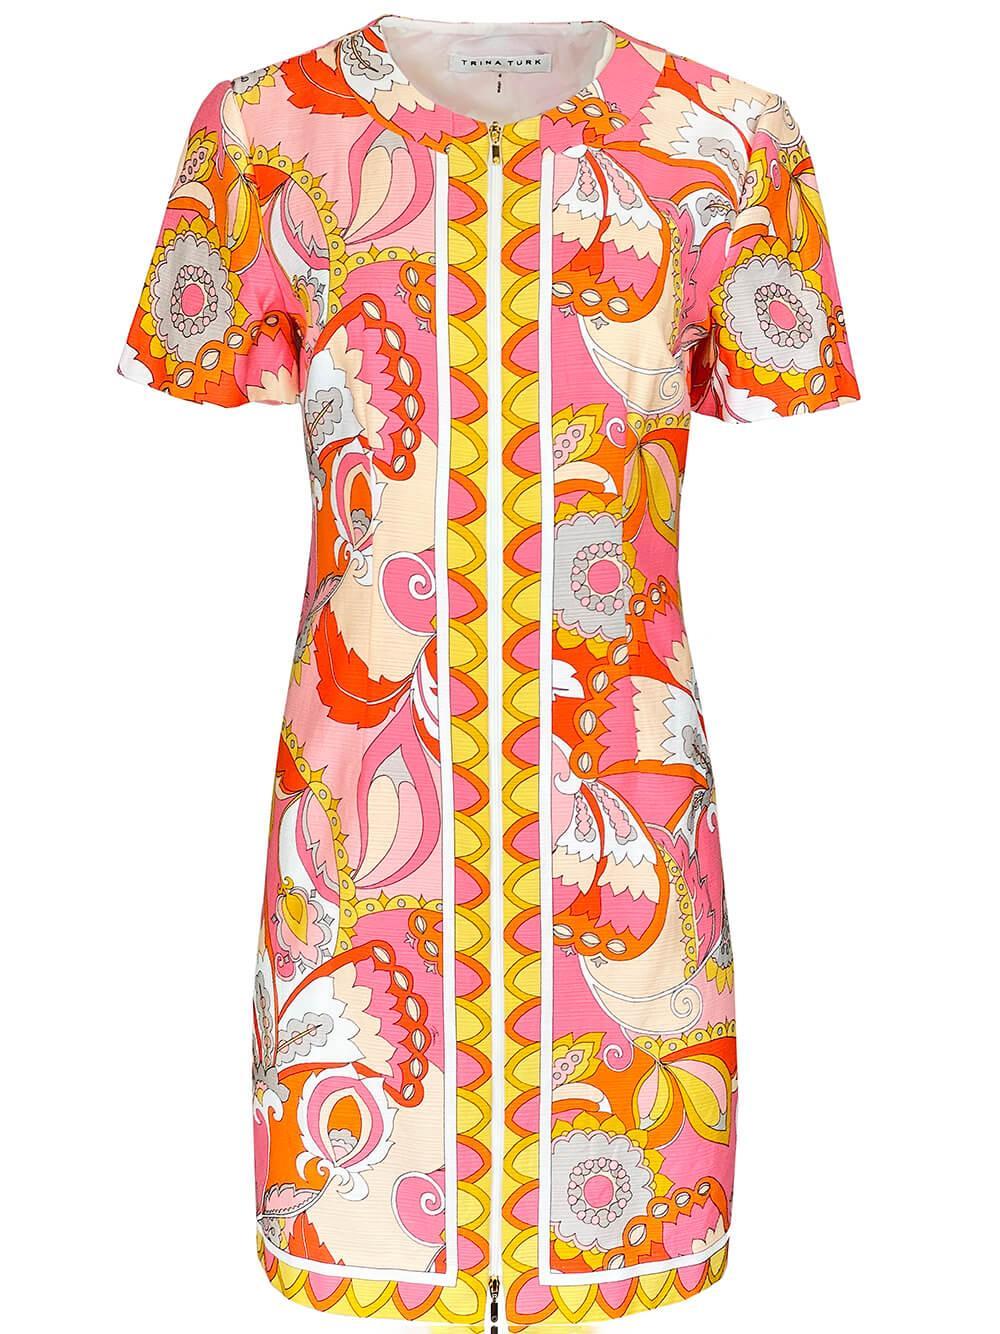 Arboretum Printed Dress